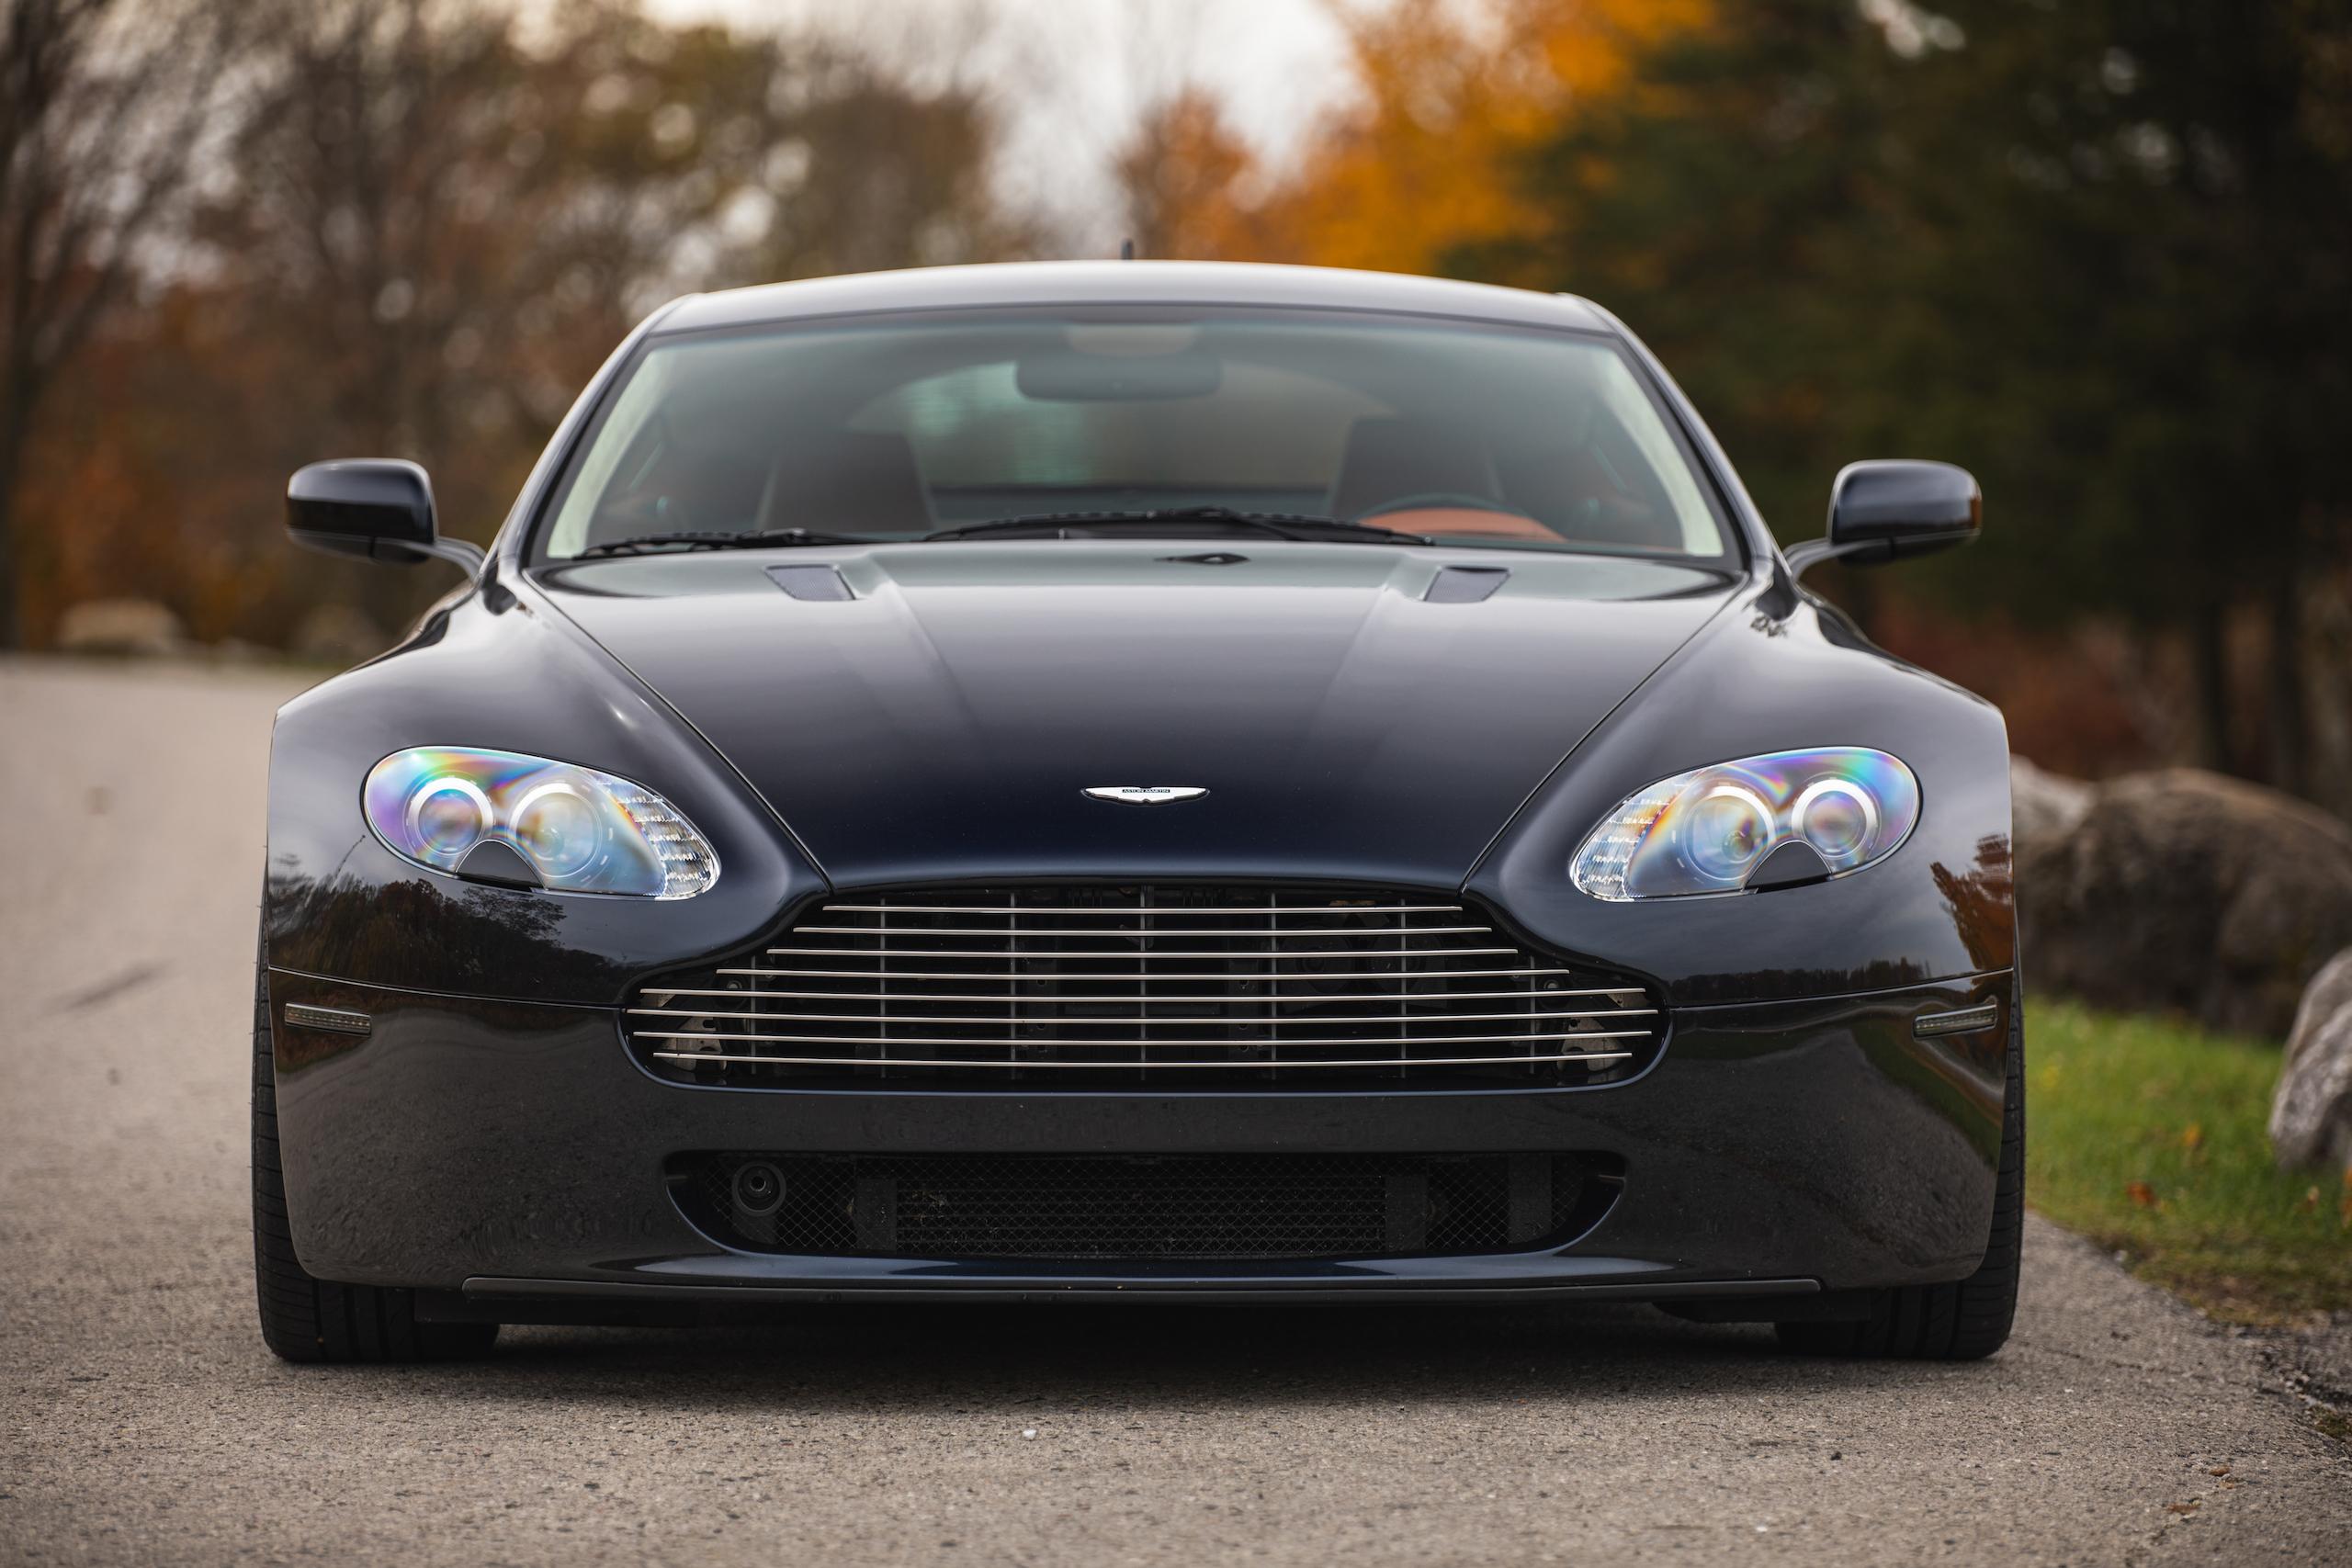 2007 Aston Martin Vantage V8 front